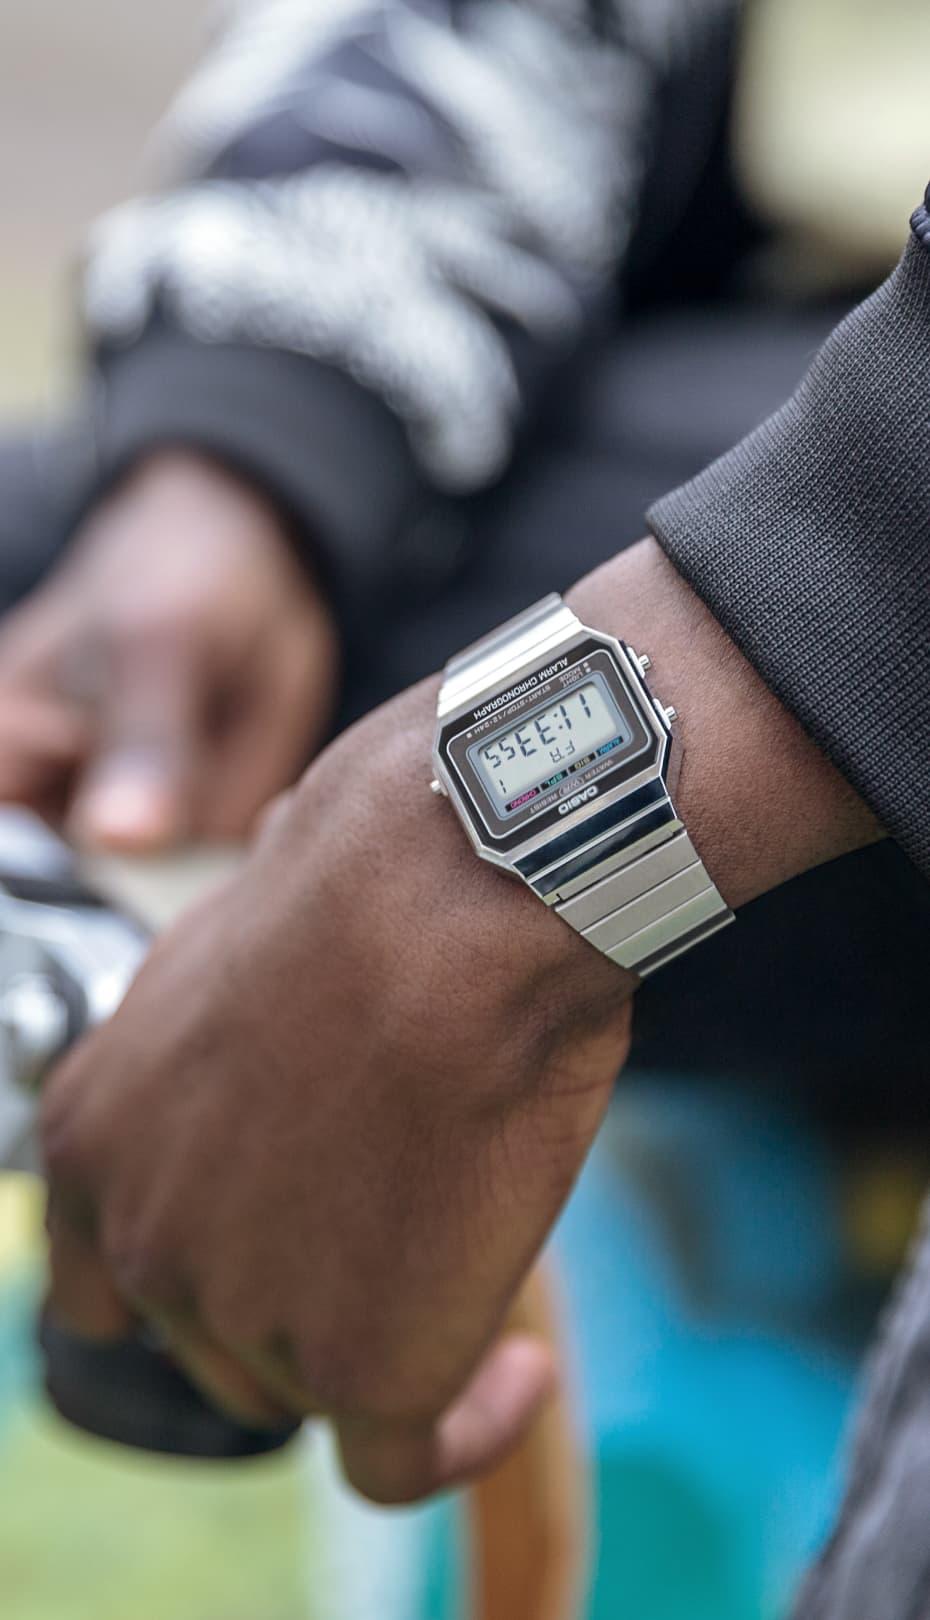 muñeca de un hombre con un reloj plata de CASIO